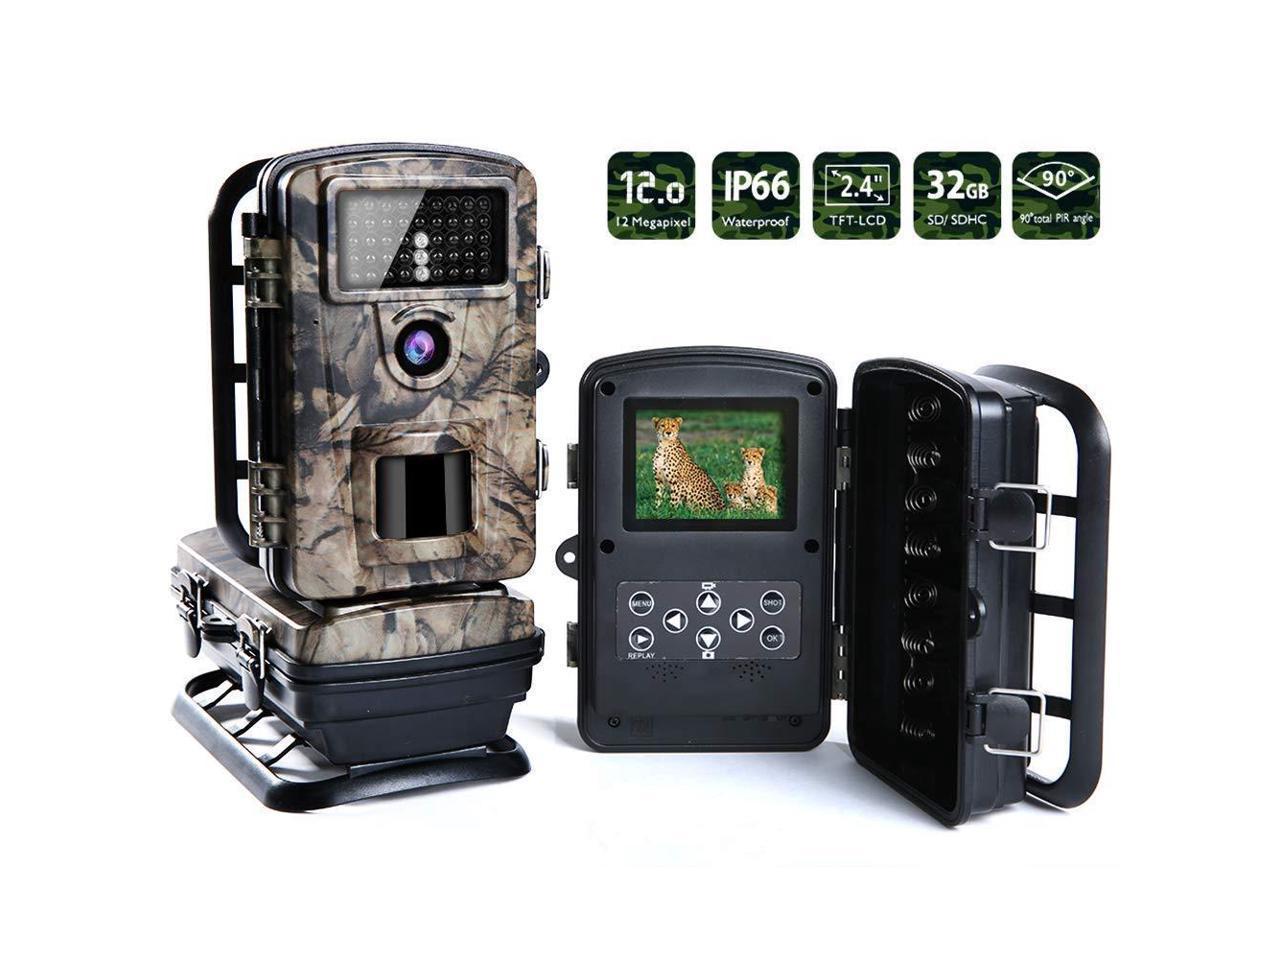 Фото-видео ловушка для охоты 700A 12MP